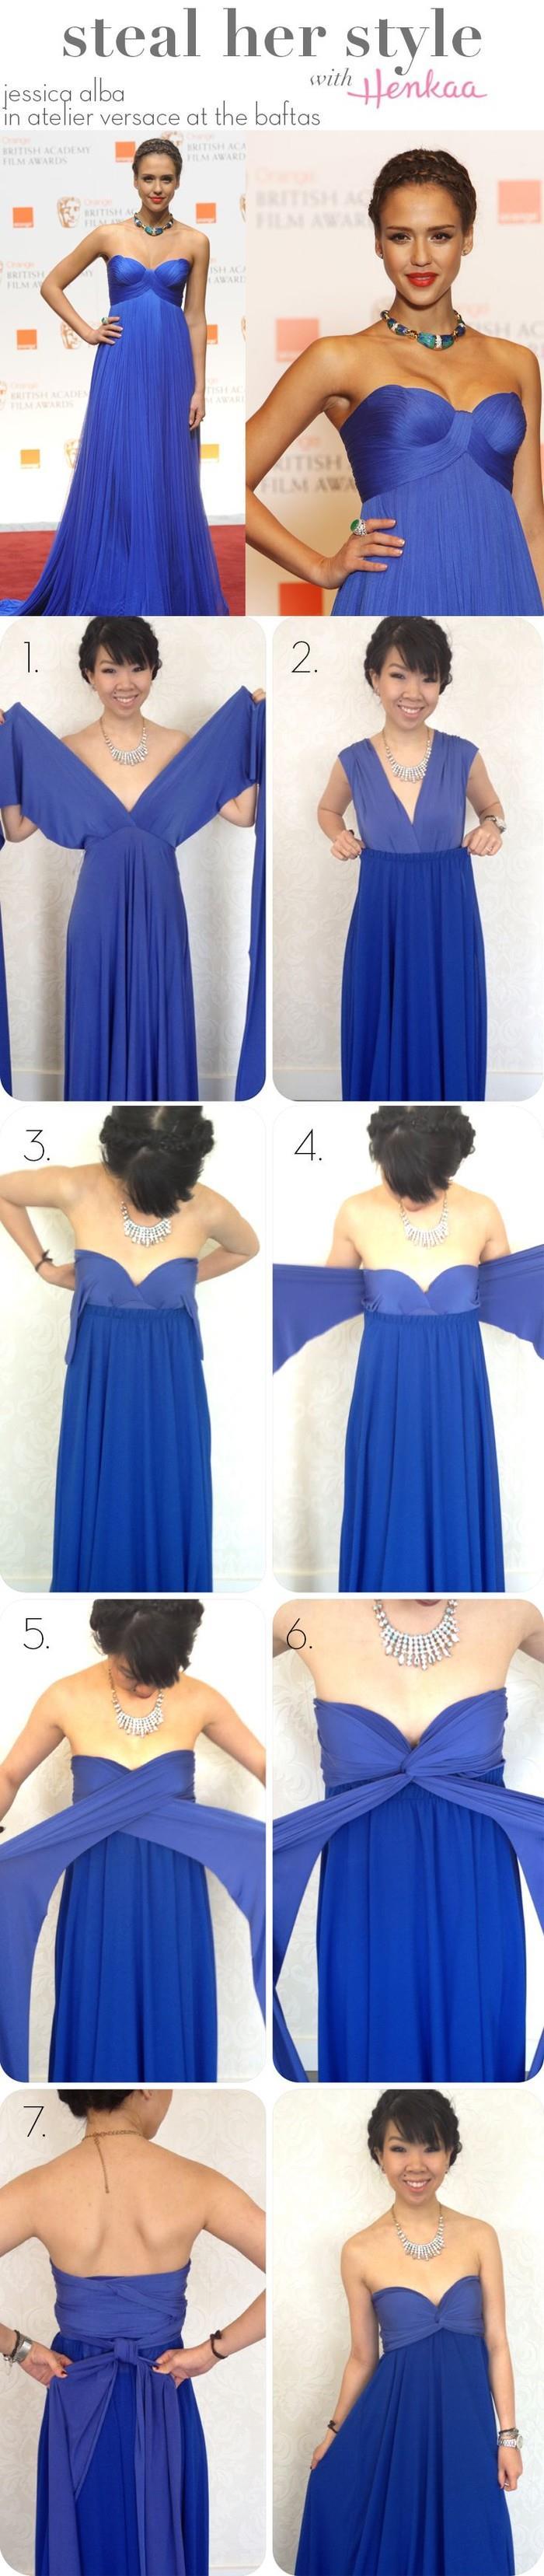 4928c2756f0fc Women Fashion sexy Twist Wrap Ways variety Wear Dress Maxi tunic Flirty  Multi Way halter Convertible Infinity Swing dressesUSD 52.69-55.69 piece